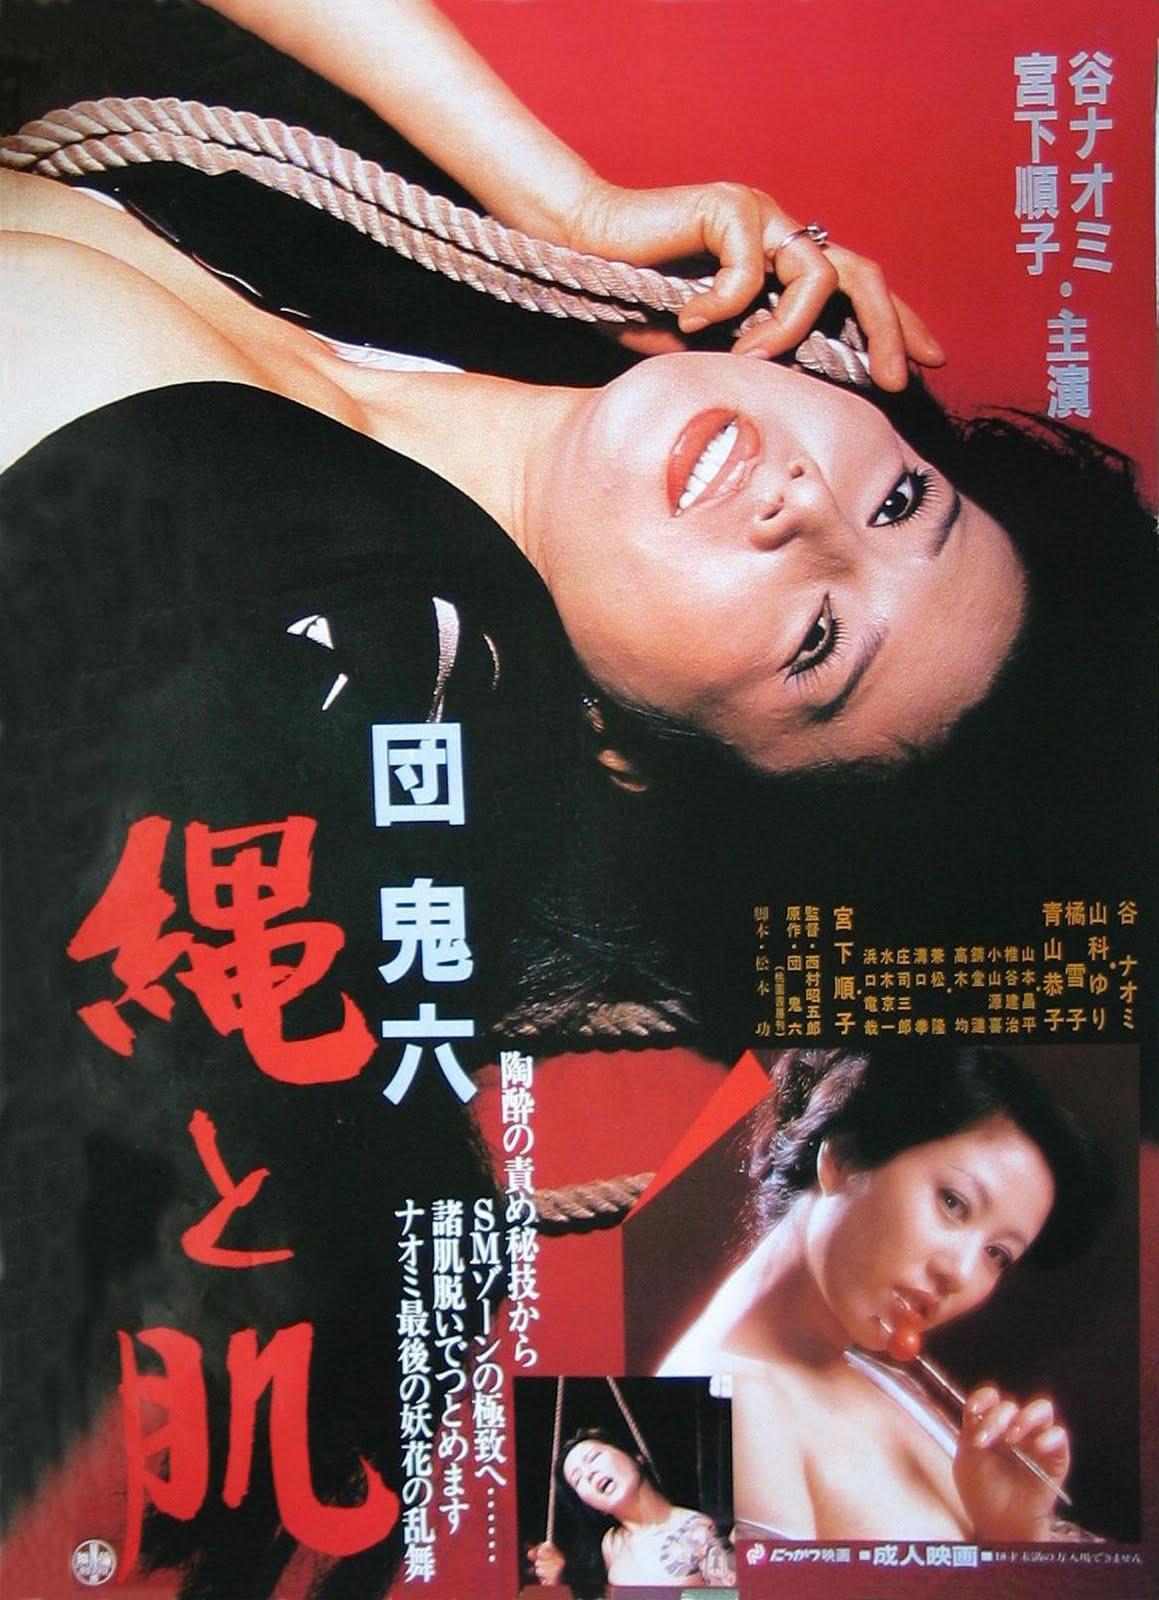 Naomi tani japanese woman peeing video reserve